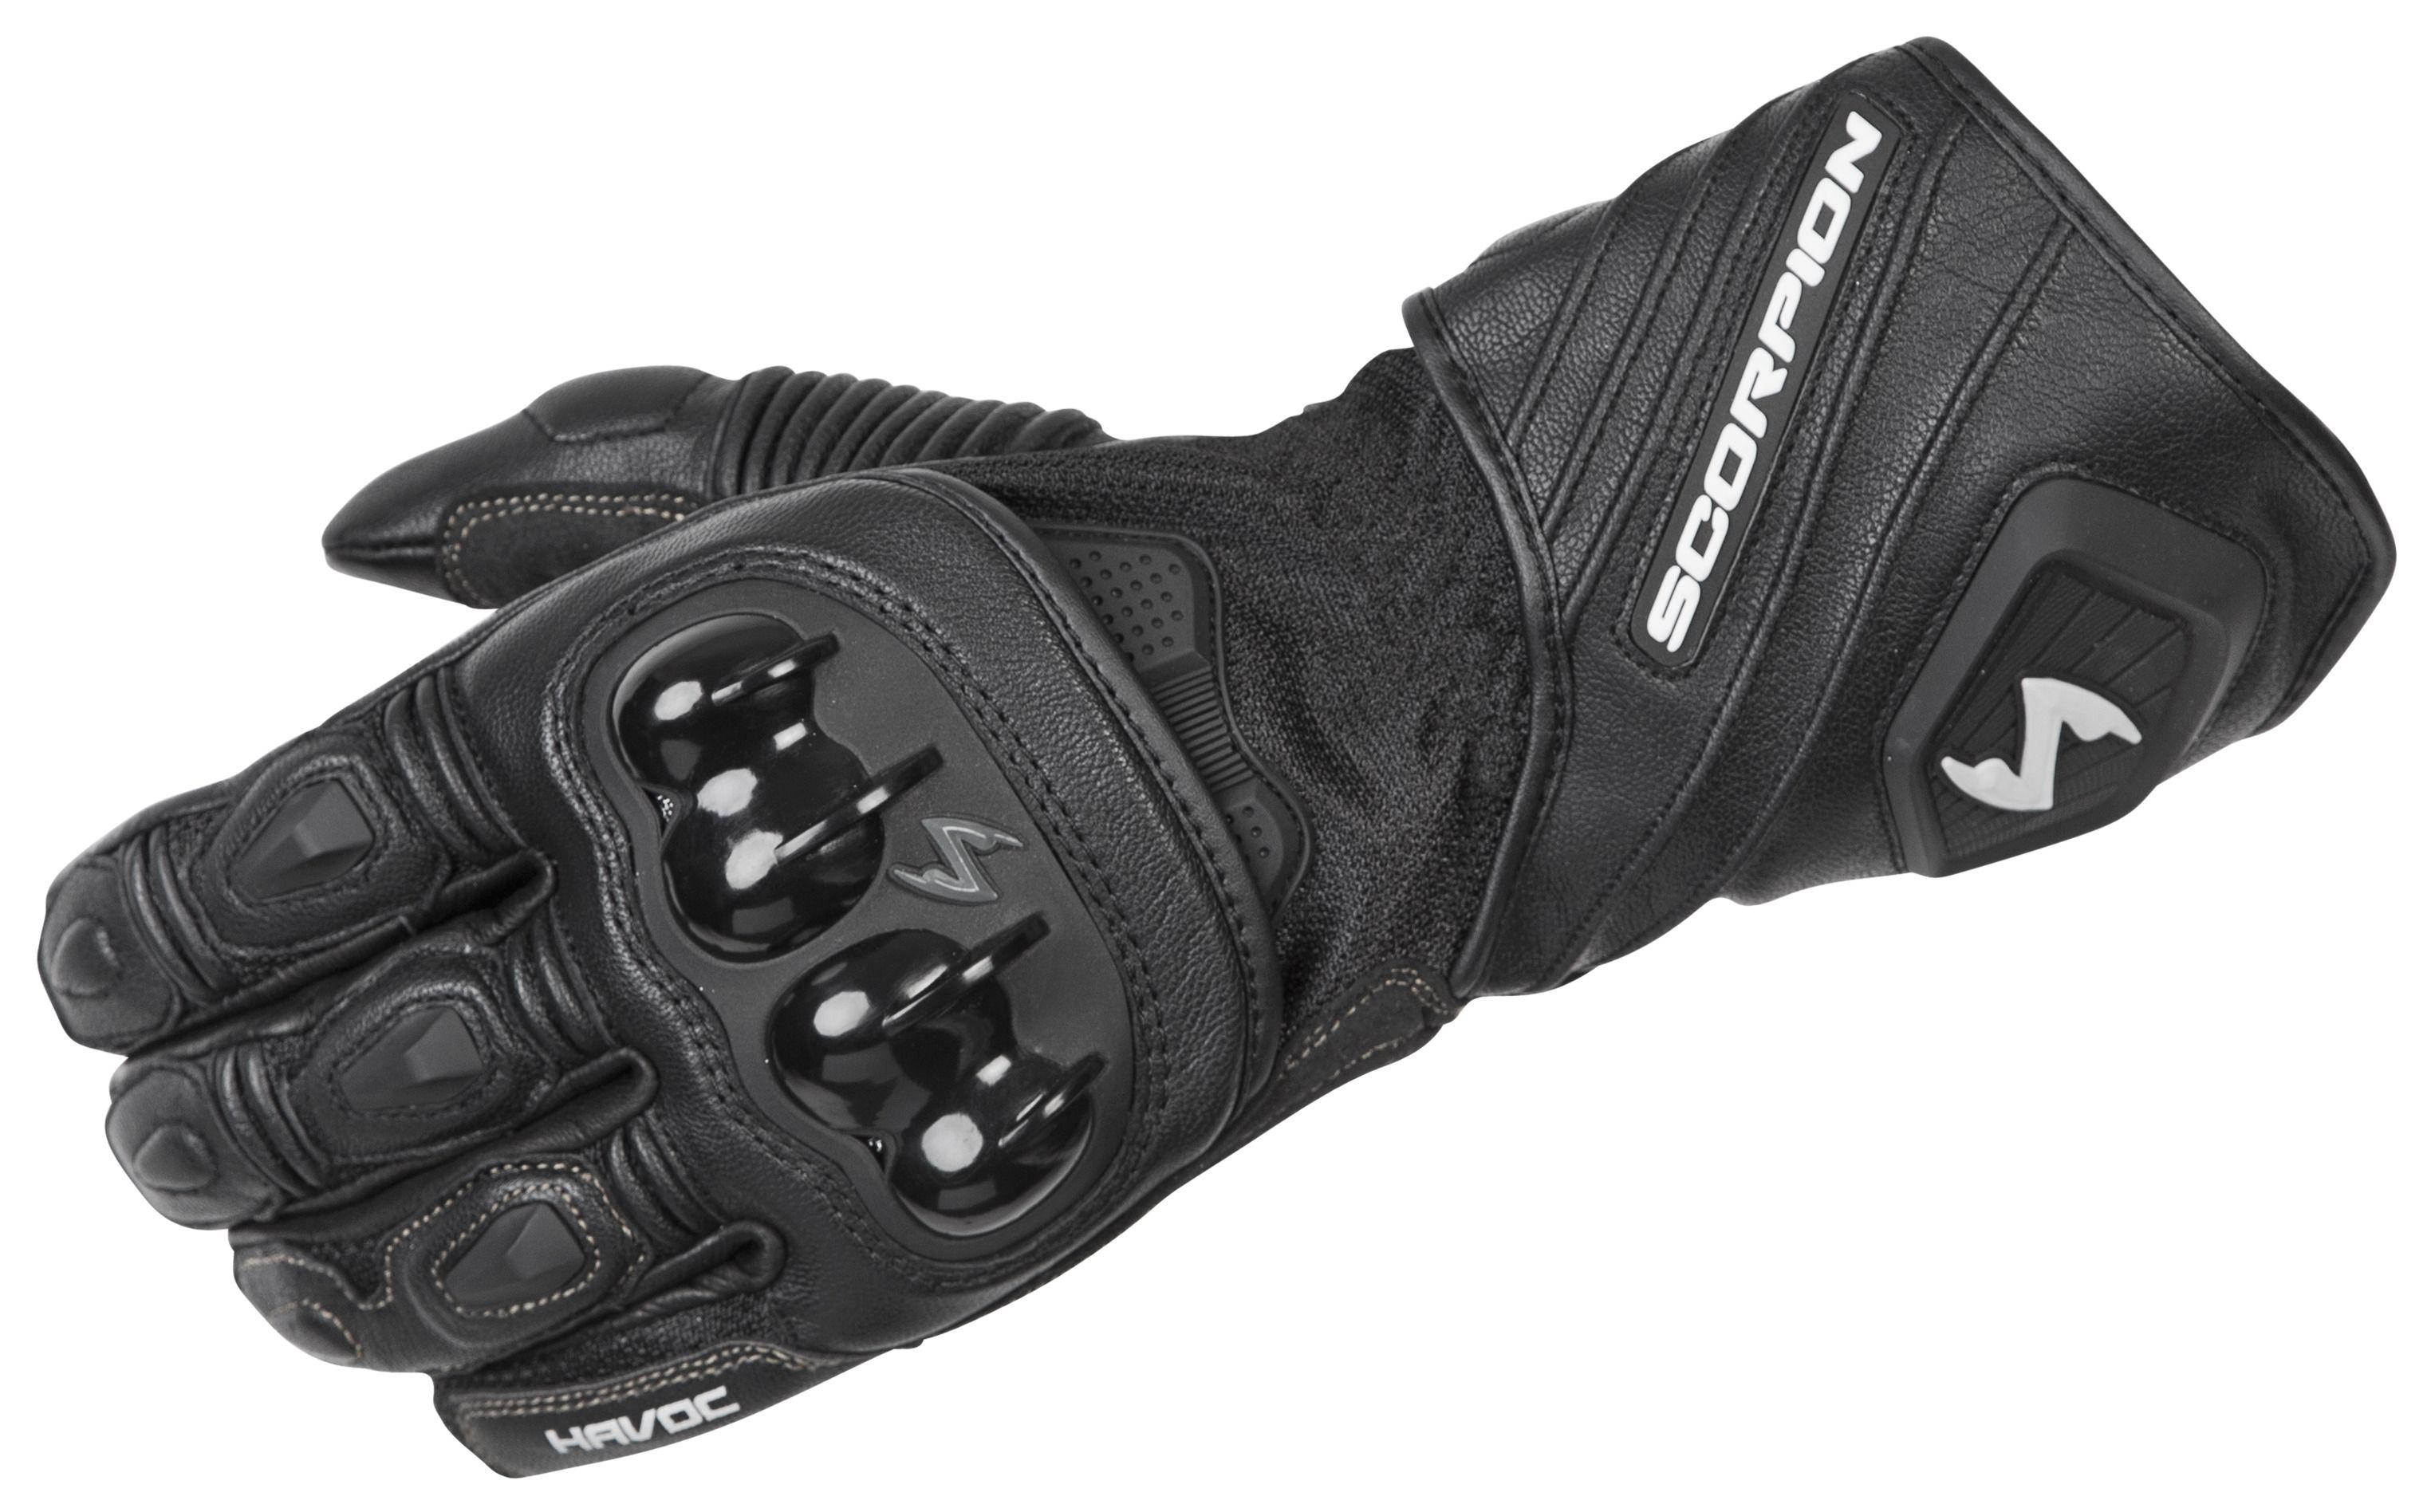 Leather gauntlet driving gloves - Leather Gauntlet Driving Gloves 50